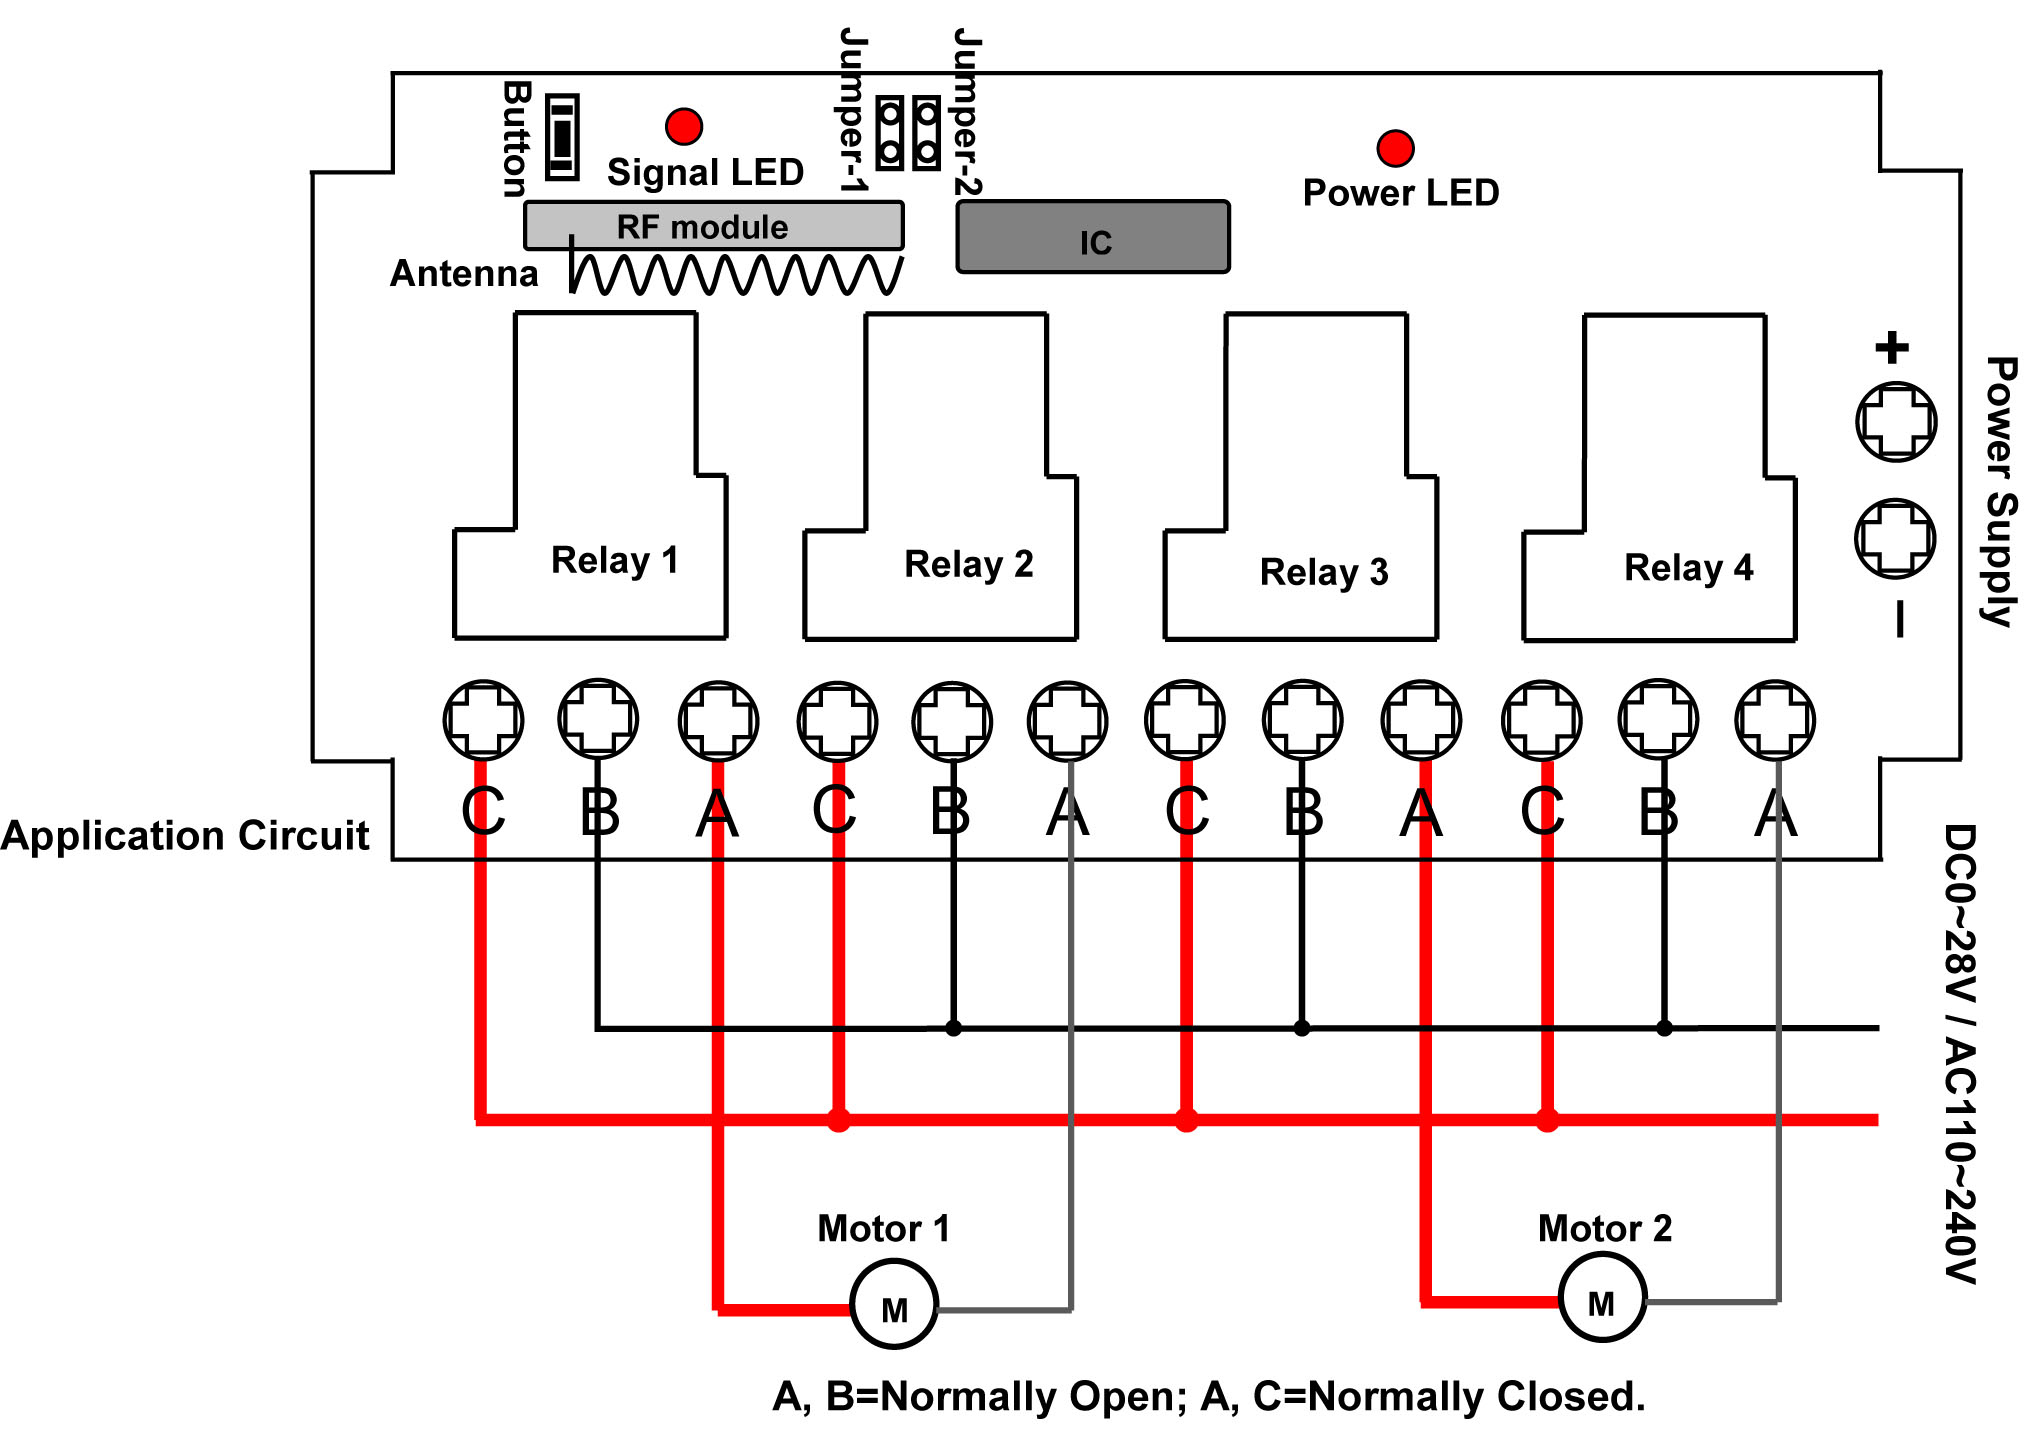 3 Button Garage Door Wiring Diagram For Control | Wiring Diagram - Garage Door Opener Wiring Diagram